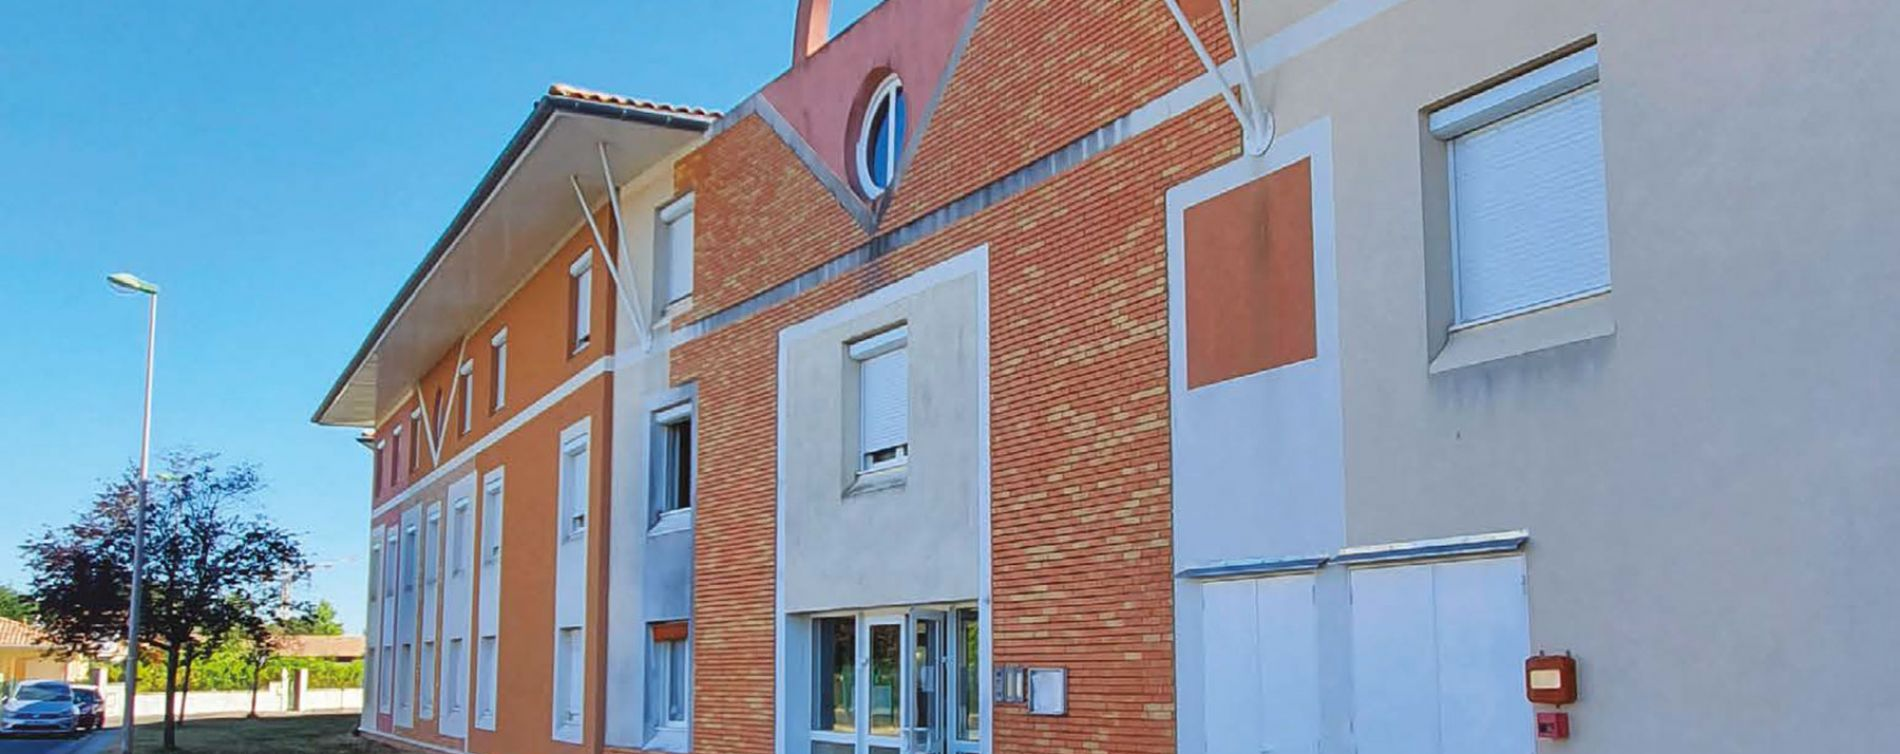 Résidence Isatis à Mérignac